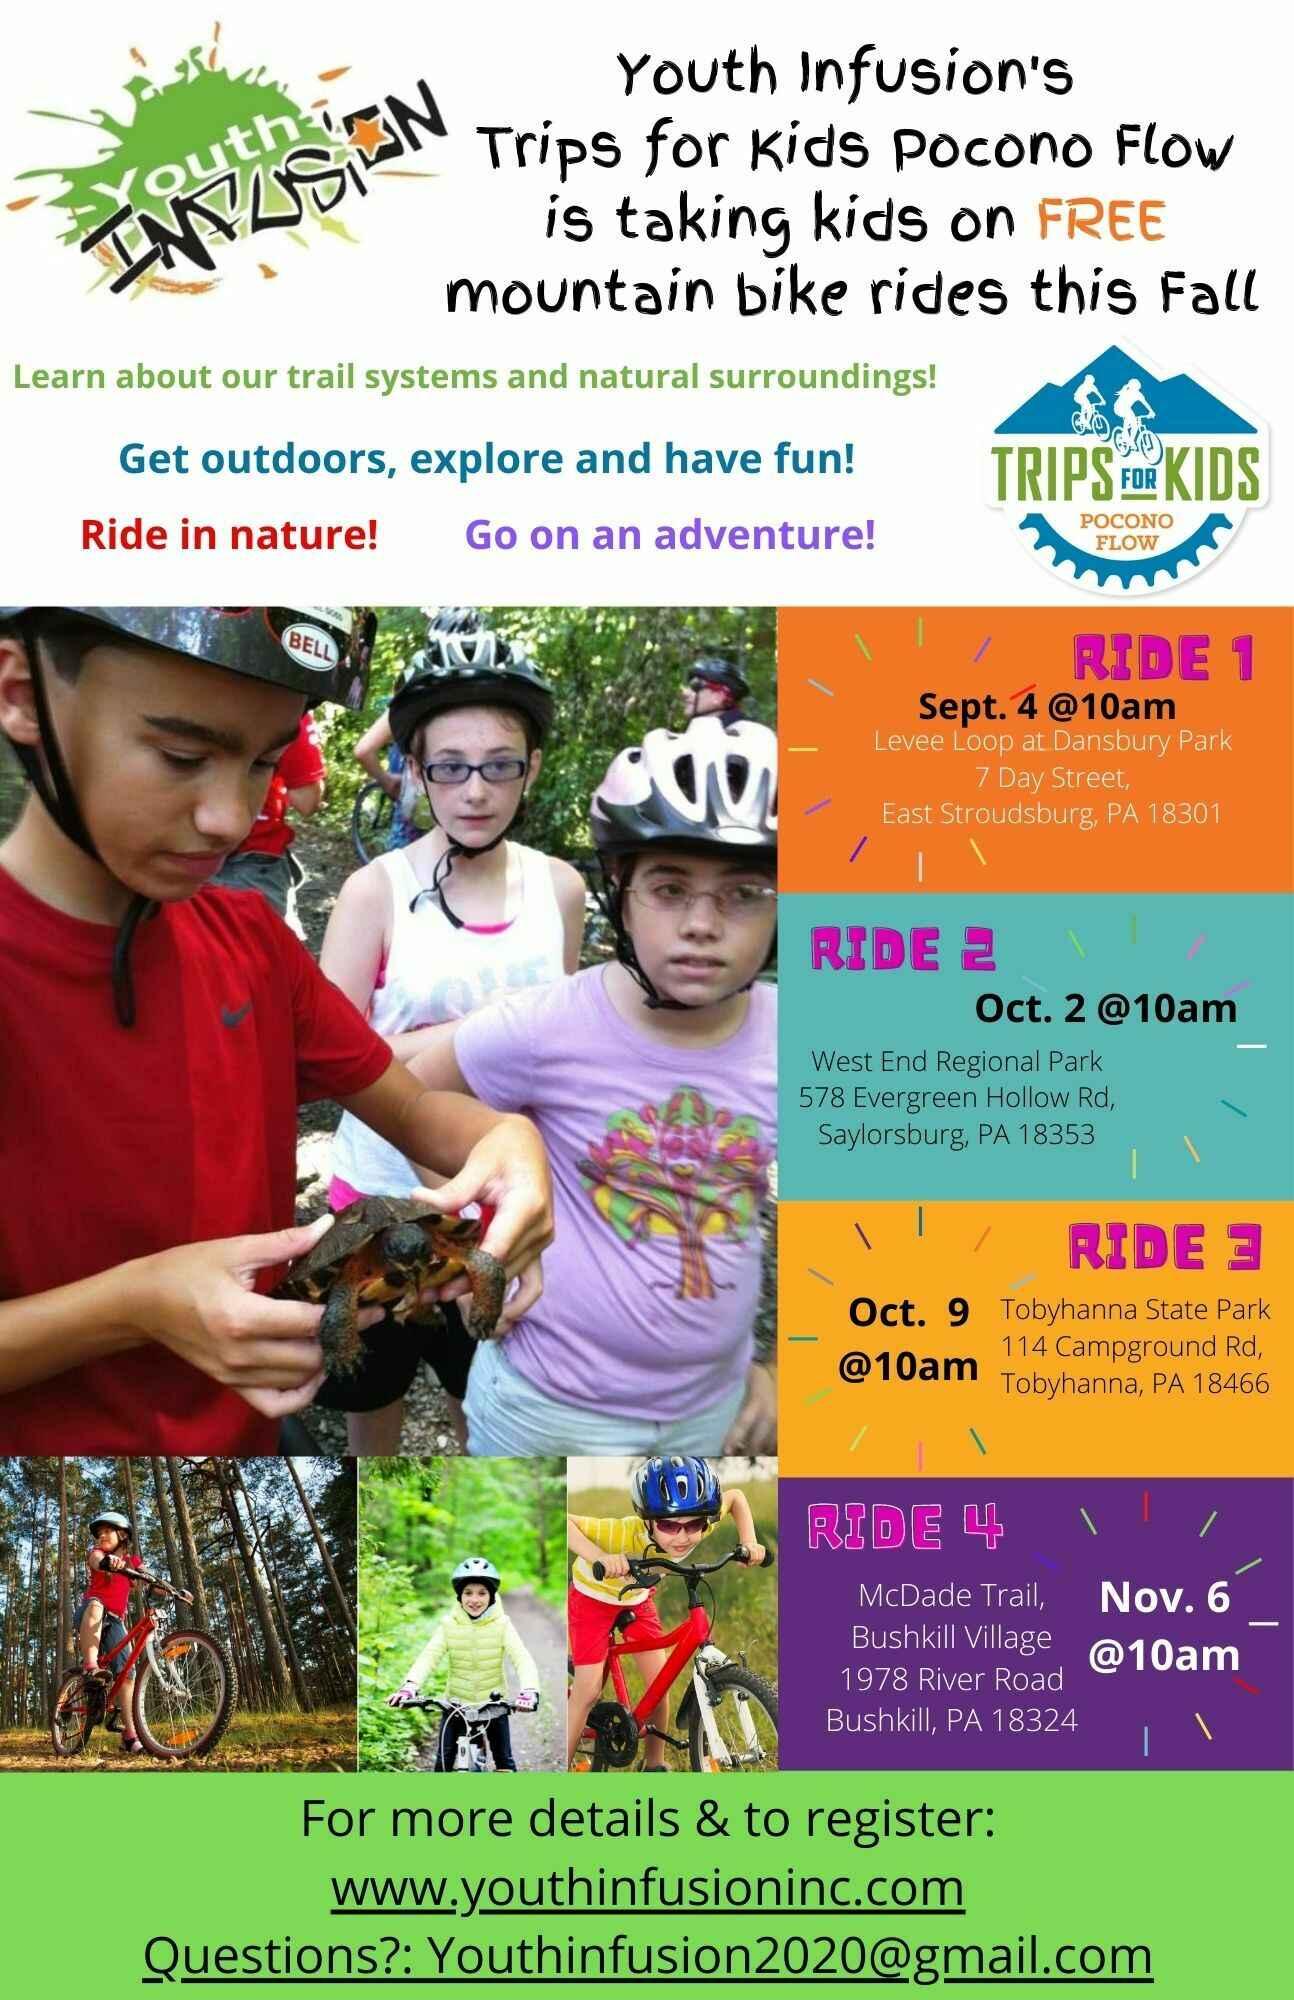 FREE Trips for Kids Pocono Flow Ride - Saturday, September 4, 2021 image